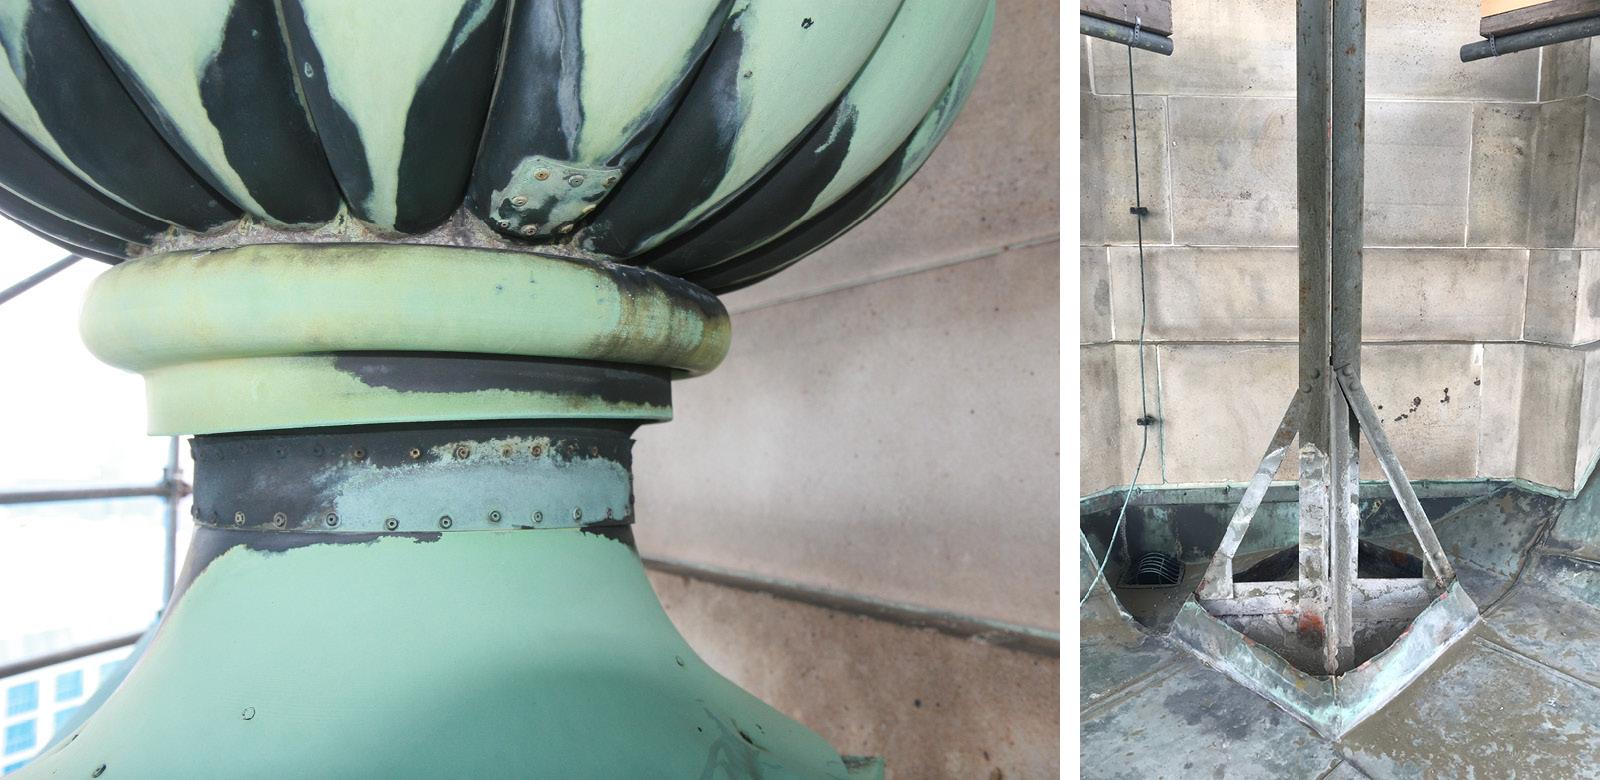 Links: Schäden an der Kupfer-Oberfläche, 2021; Rechts: Unterkonstruktion, 2021